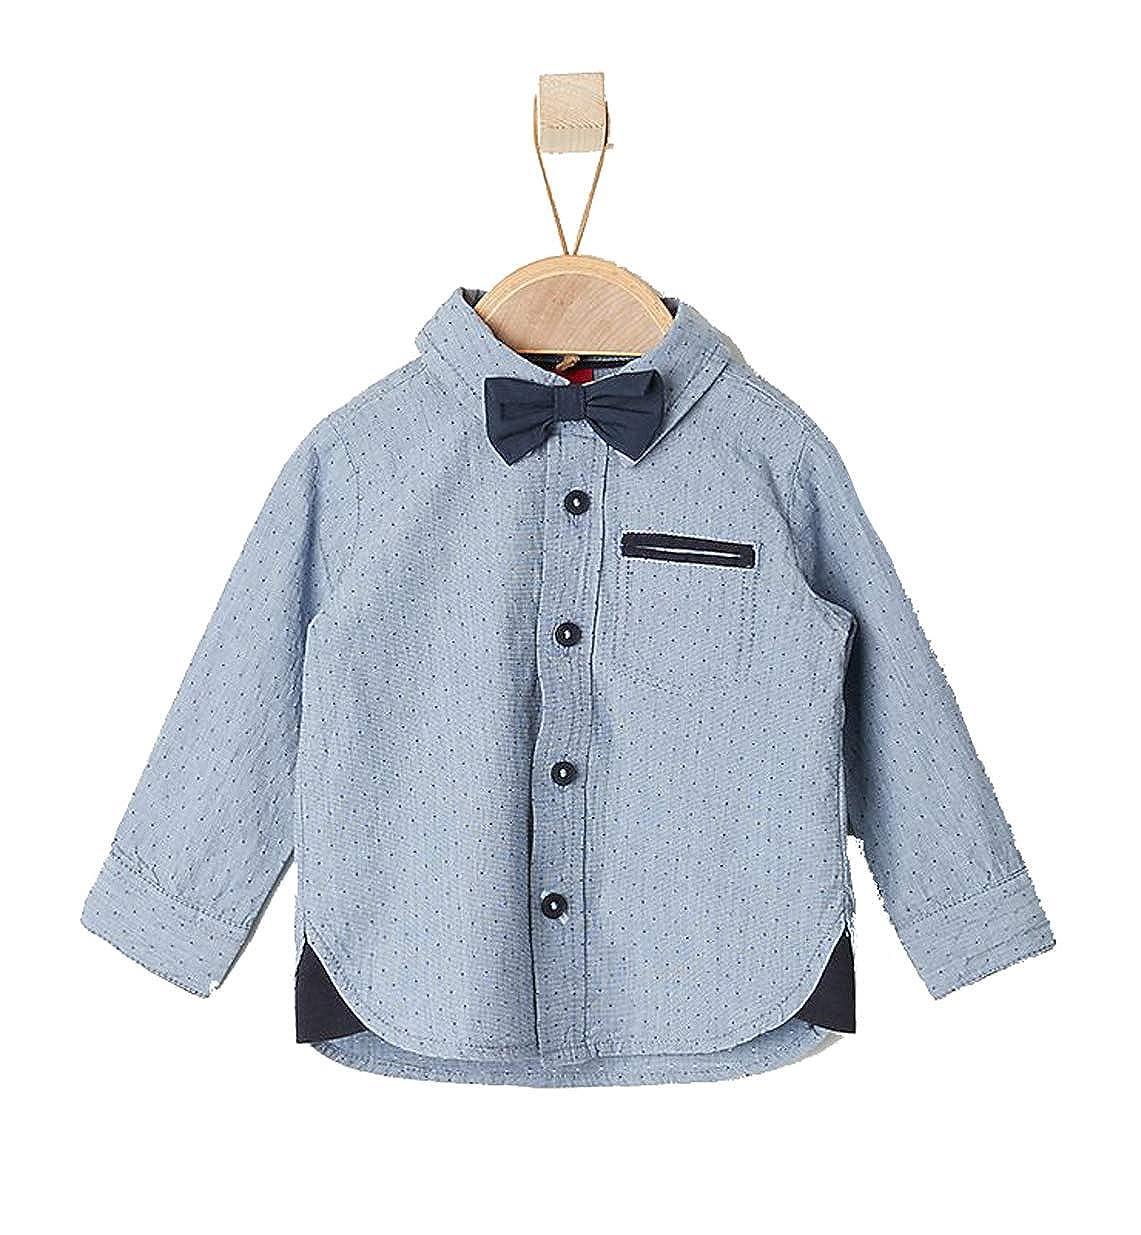 s.Oliver Baby-Jungen Hemd 65.811.21.6900